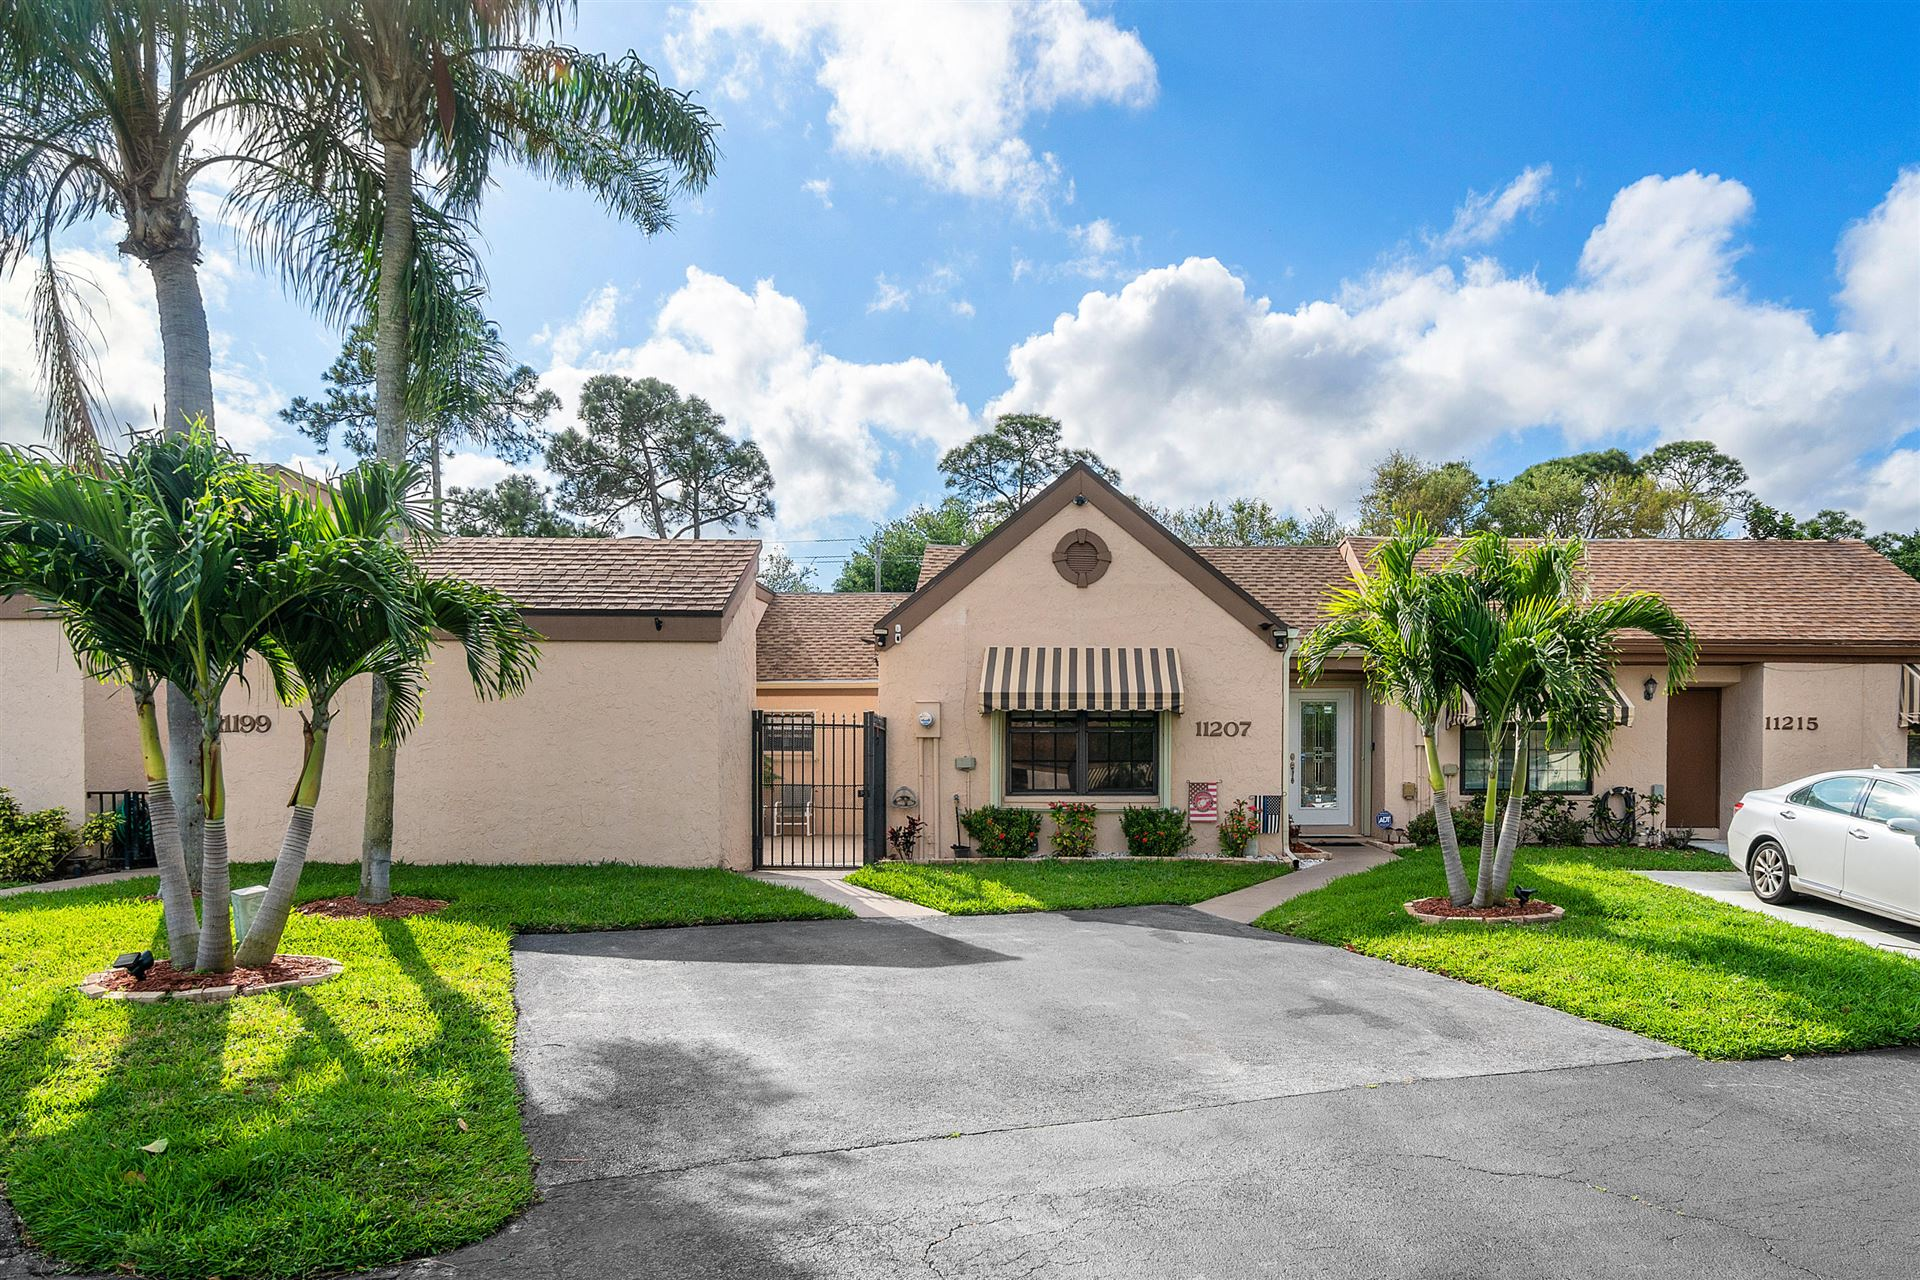 Photo of 11207 Curry Drive, Palm Beach Gardens, FL 33418 (MLS # RX-10700119)